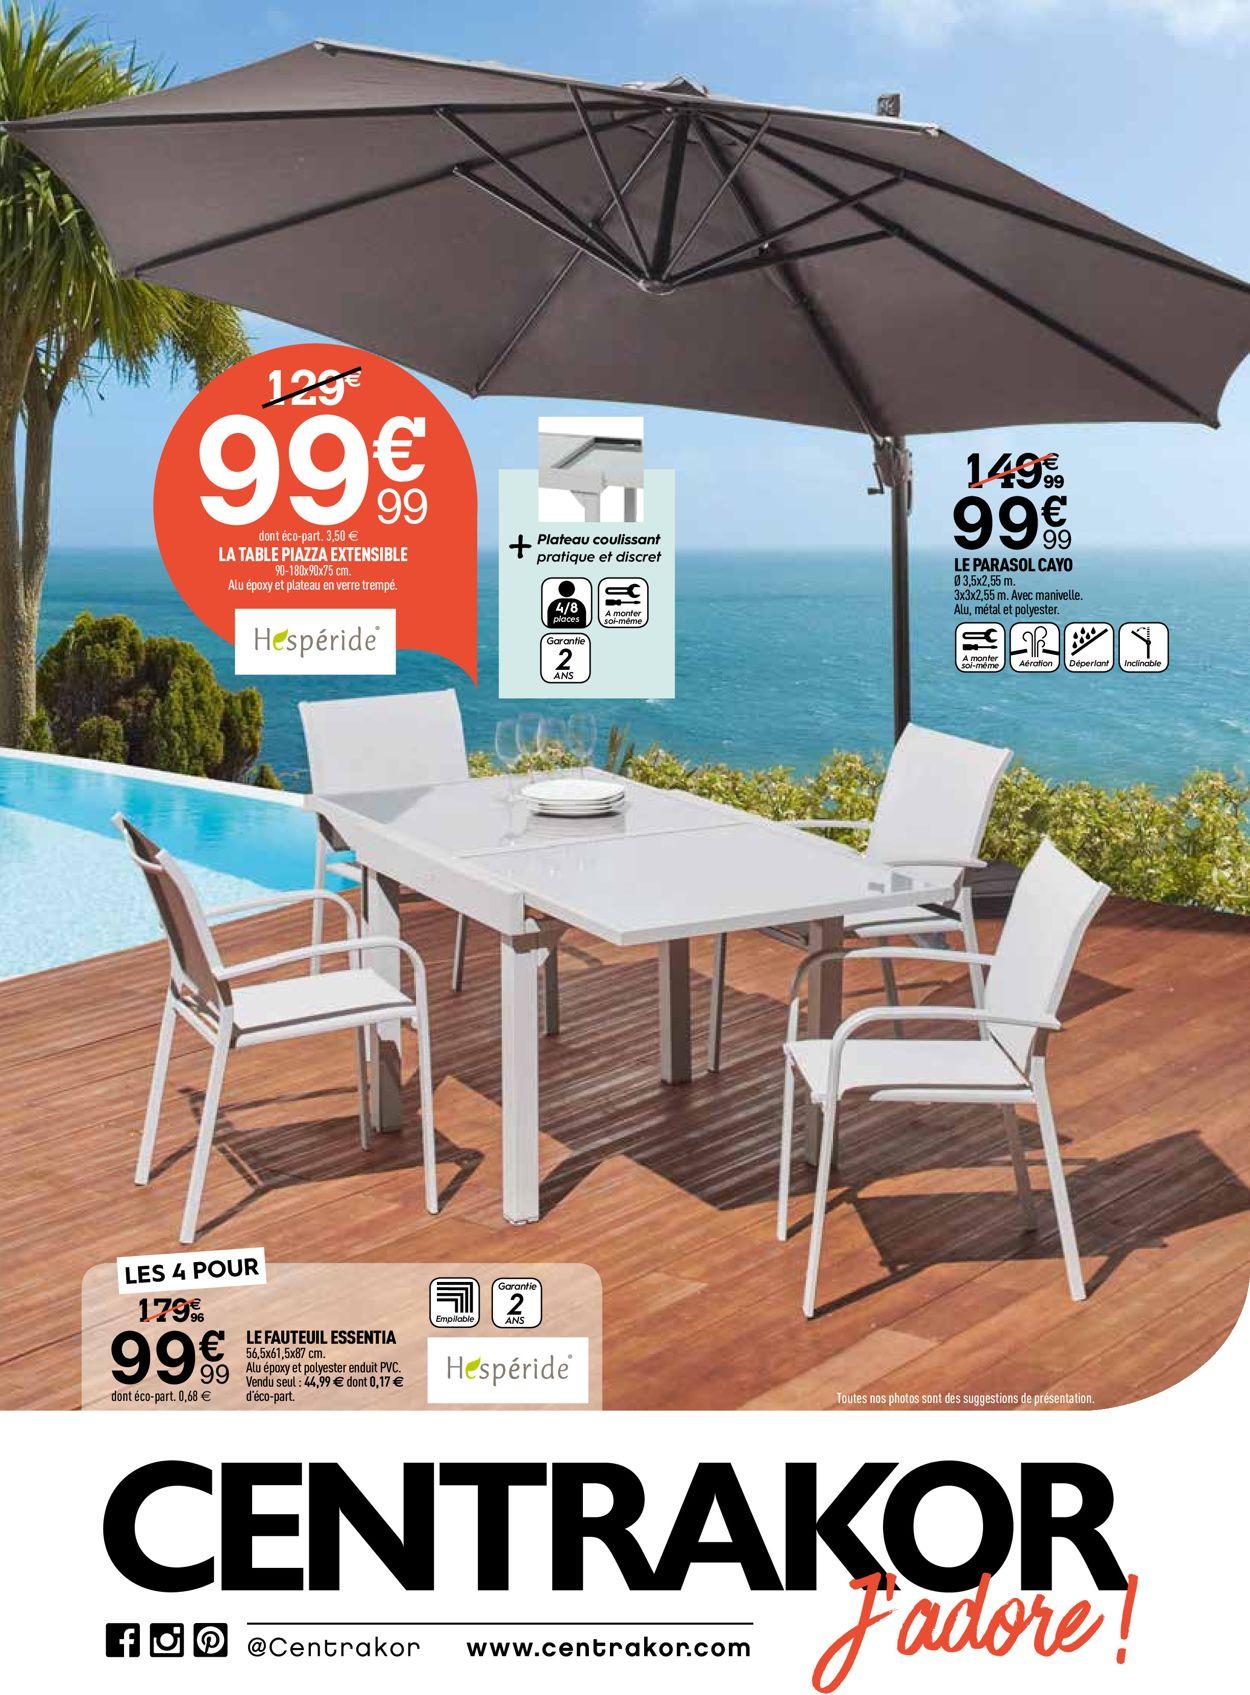 Centrakor Catalogue Actuel 25.05 - 30.06.2020 - Catalogue-24 concernant Fauteuil Hesperide Piazza Centrakor